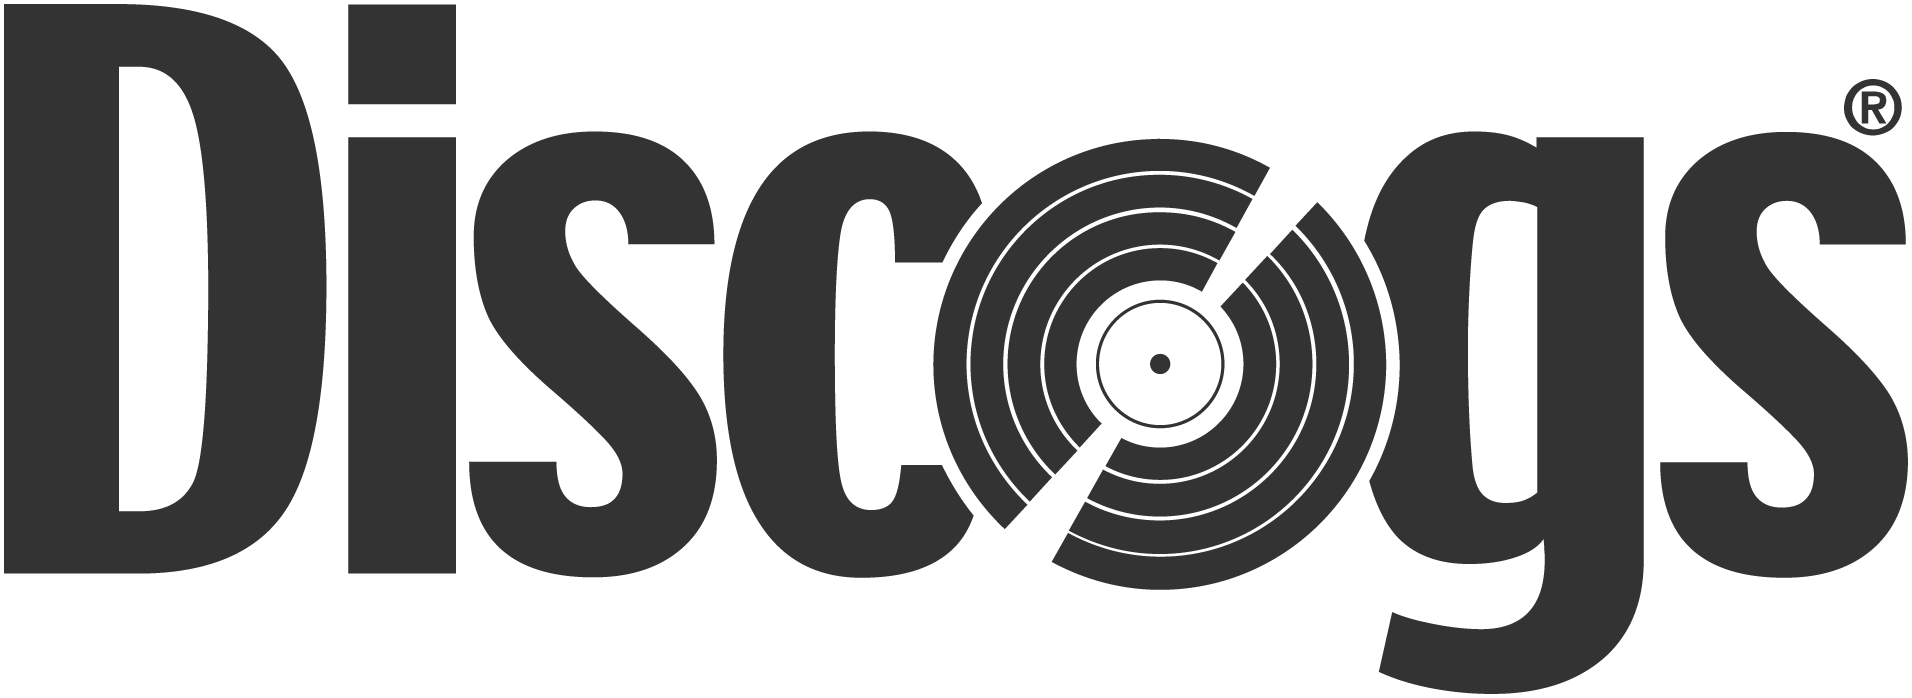 therealfunkyou on Discogs